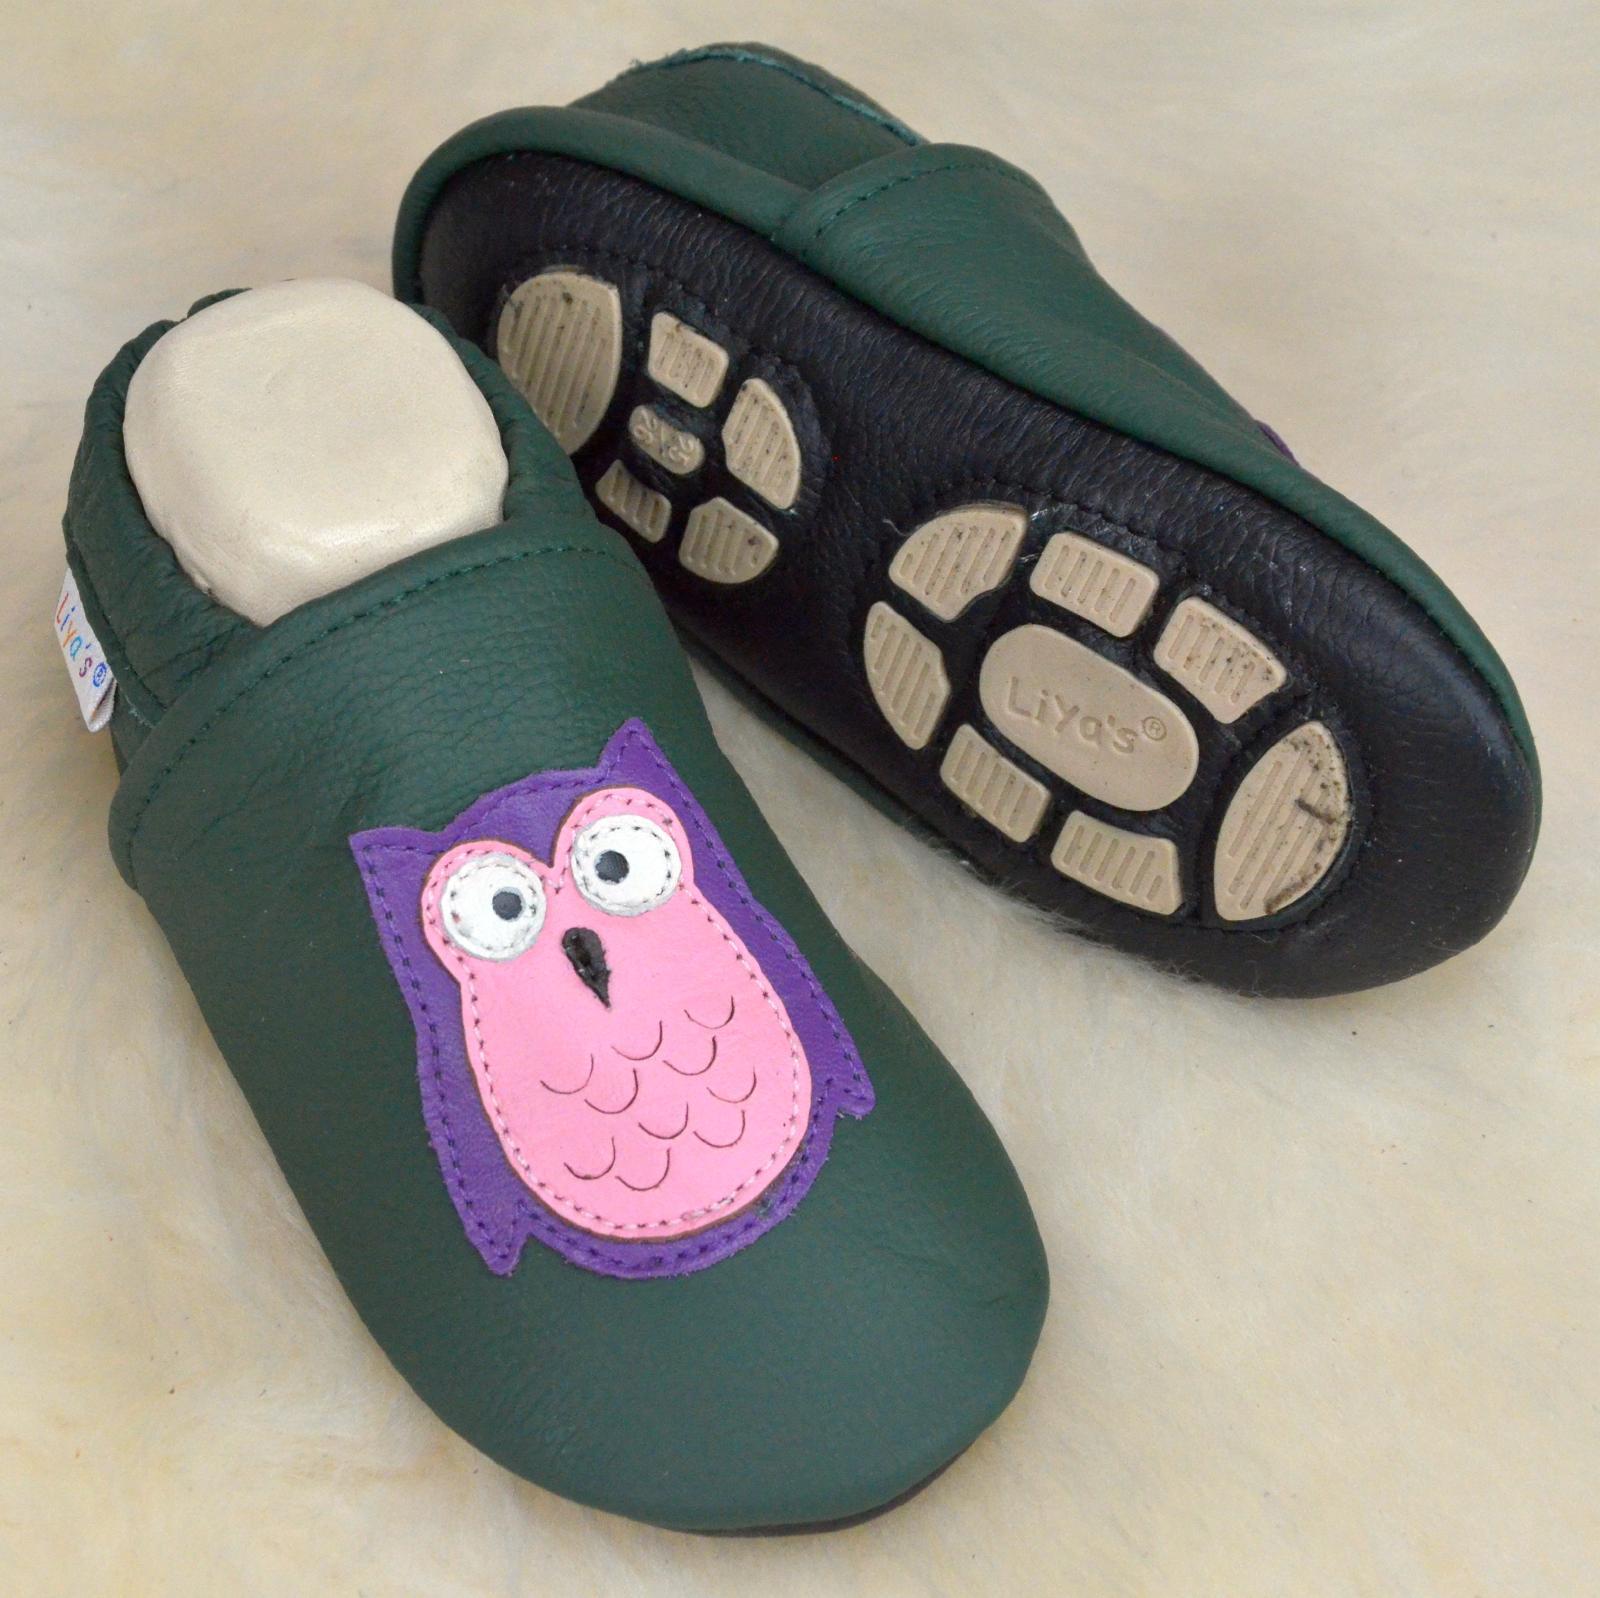 Liya's Babyschuhe Hausschuhe Lederpuschen - #638 Eule in kieferngrün